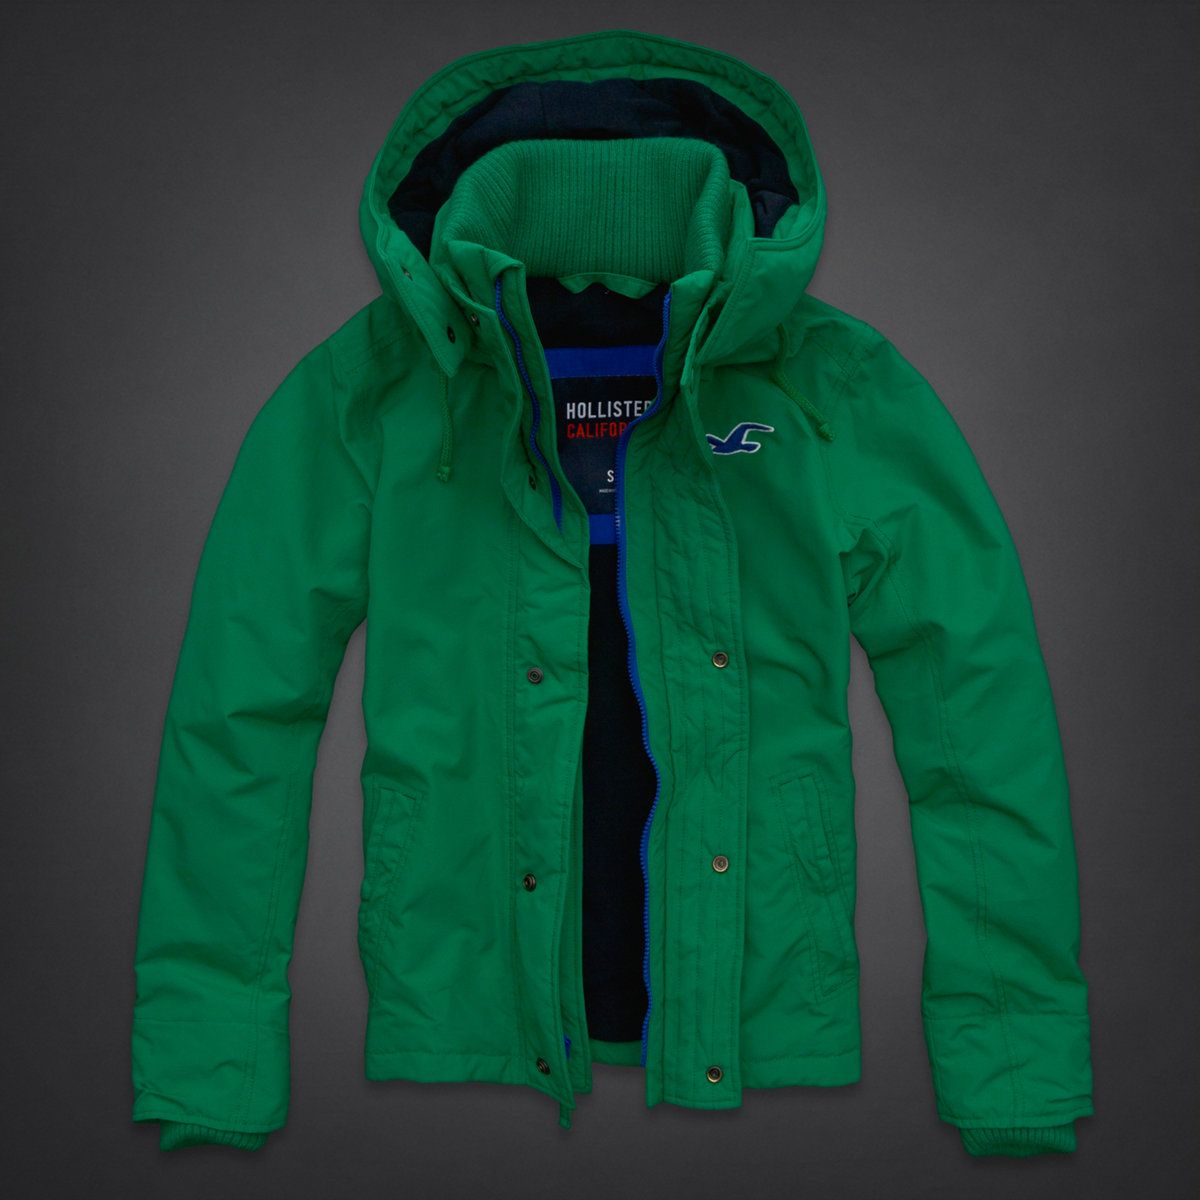 Hollisterco Com Jackets All Weather Jackets Outerwear Jackets [ 1200 x 1200 Pixel ]